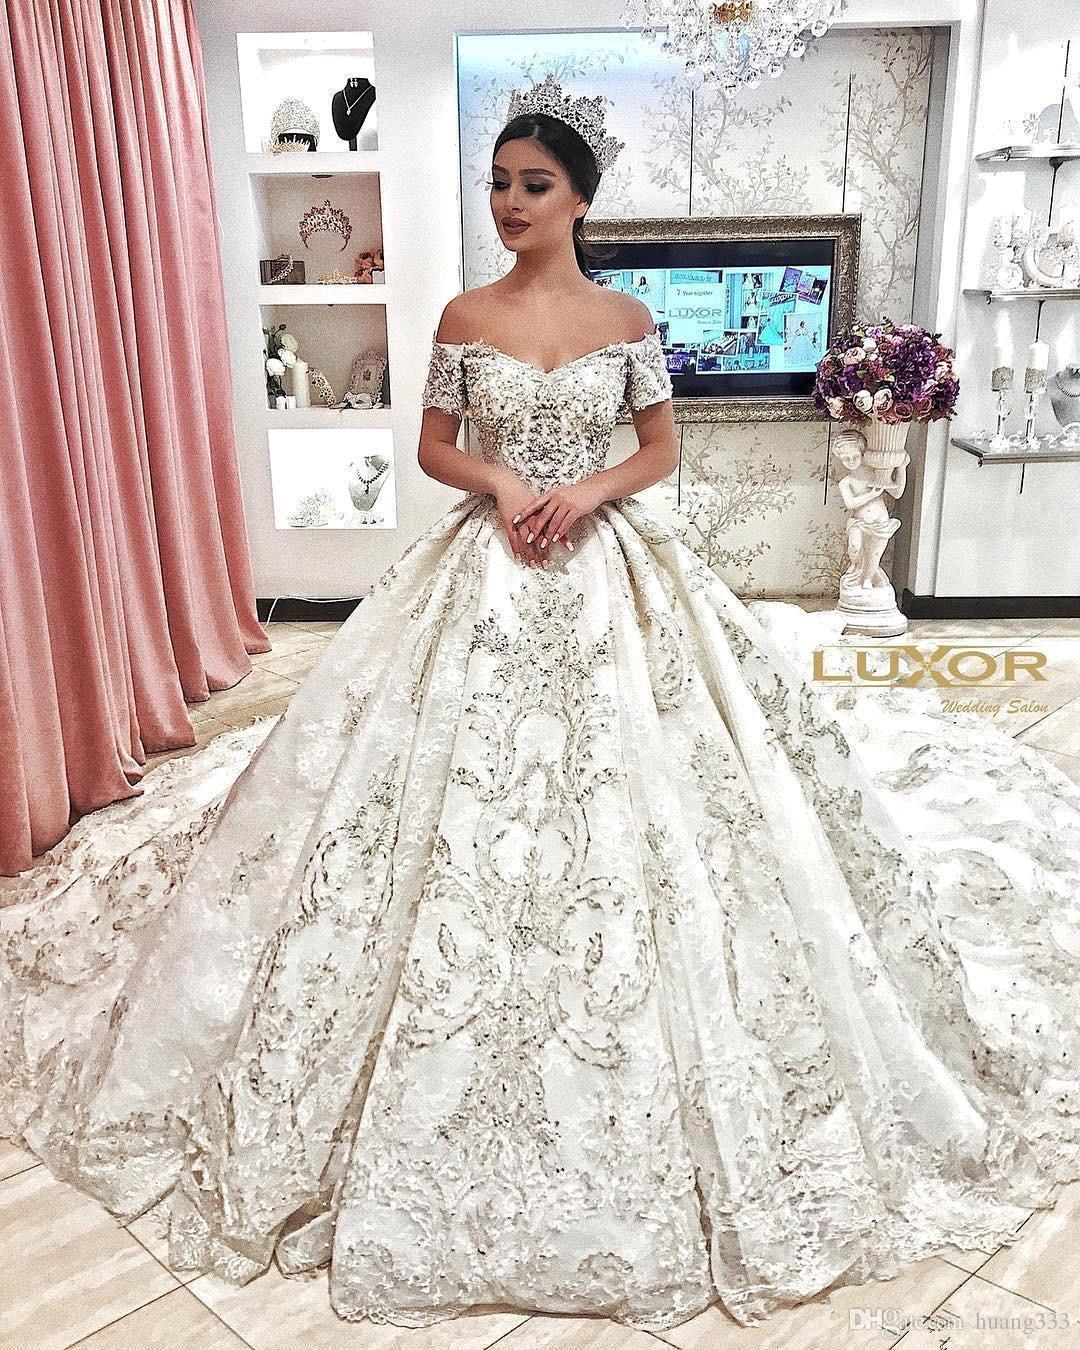 2019 New Princess Beaded Off Shoulder Ball Gown Wedding Dresses Arabic Dubai Appliques Bridal Gown robe de mariee